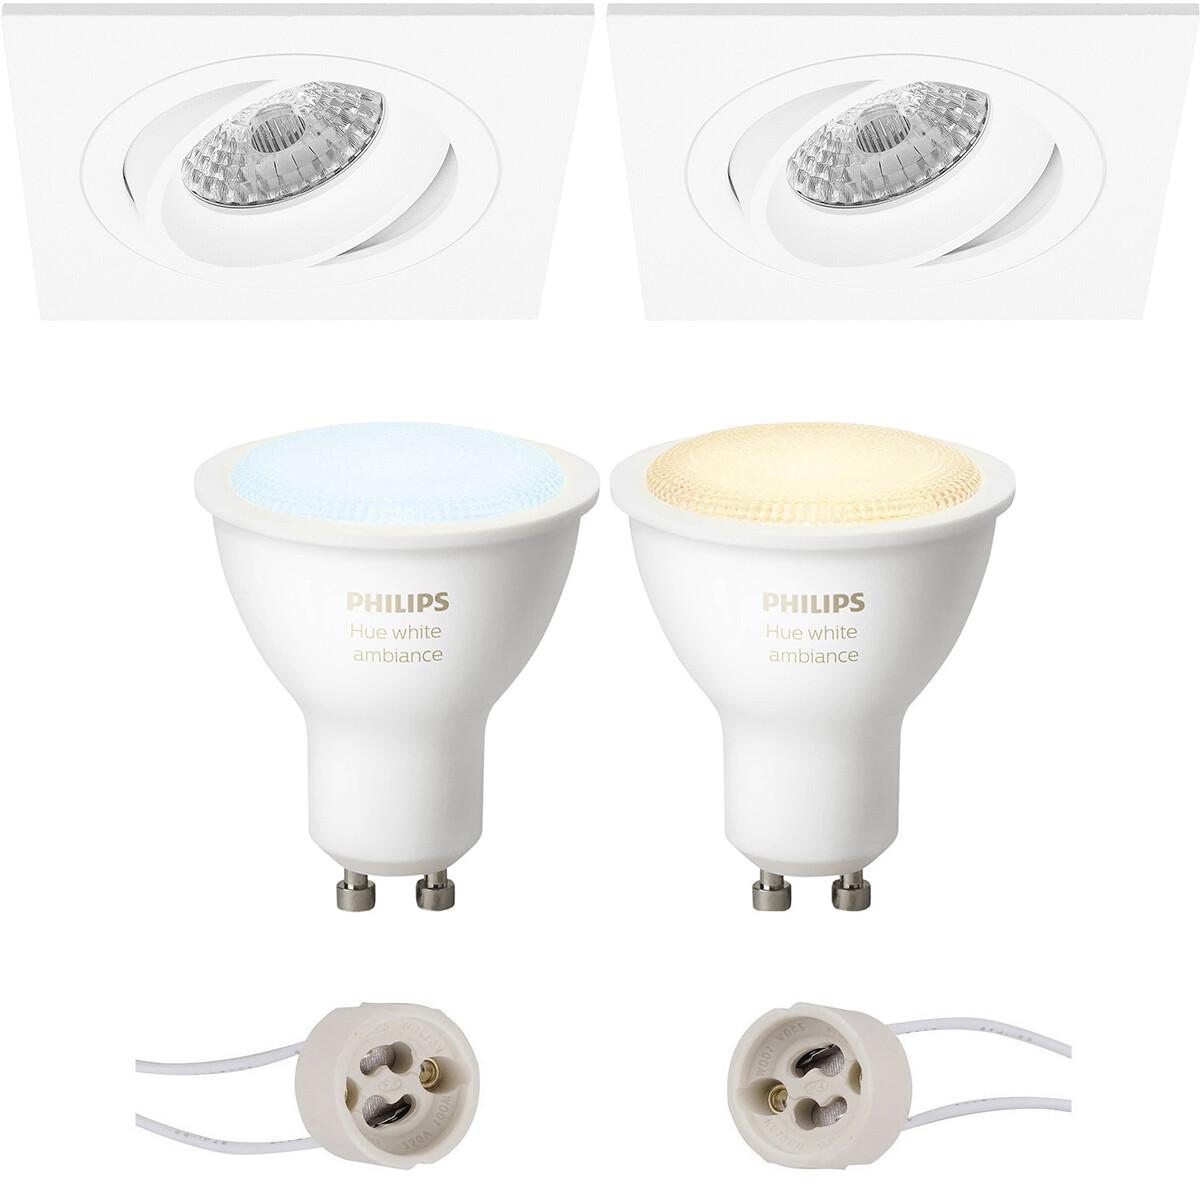 Pragmi Borny Pro - Inbouw Vierkant - Mat Wit - Kantelbaar - 92mm - Philips Hue - LED Spot Set GU10 -